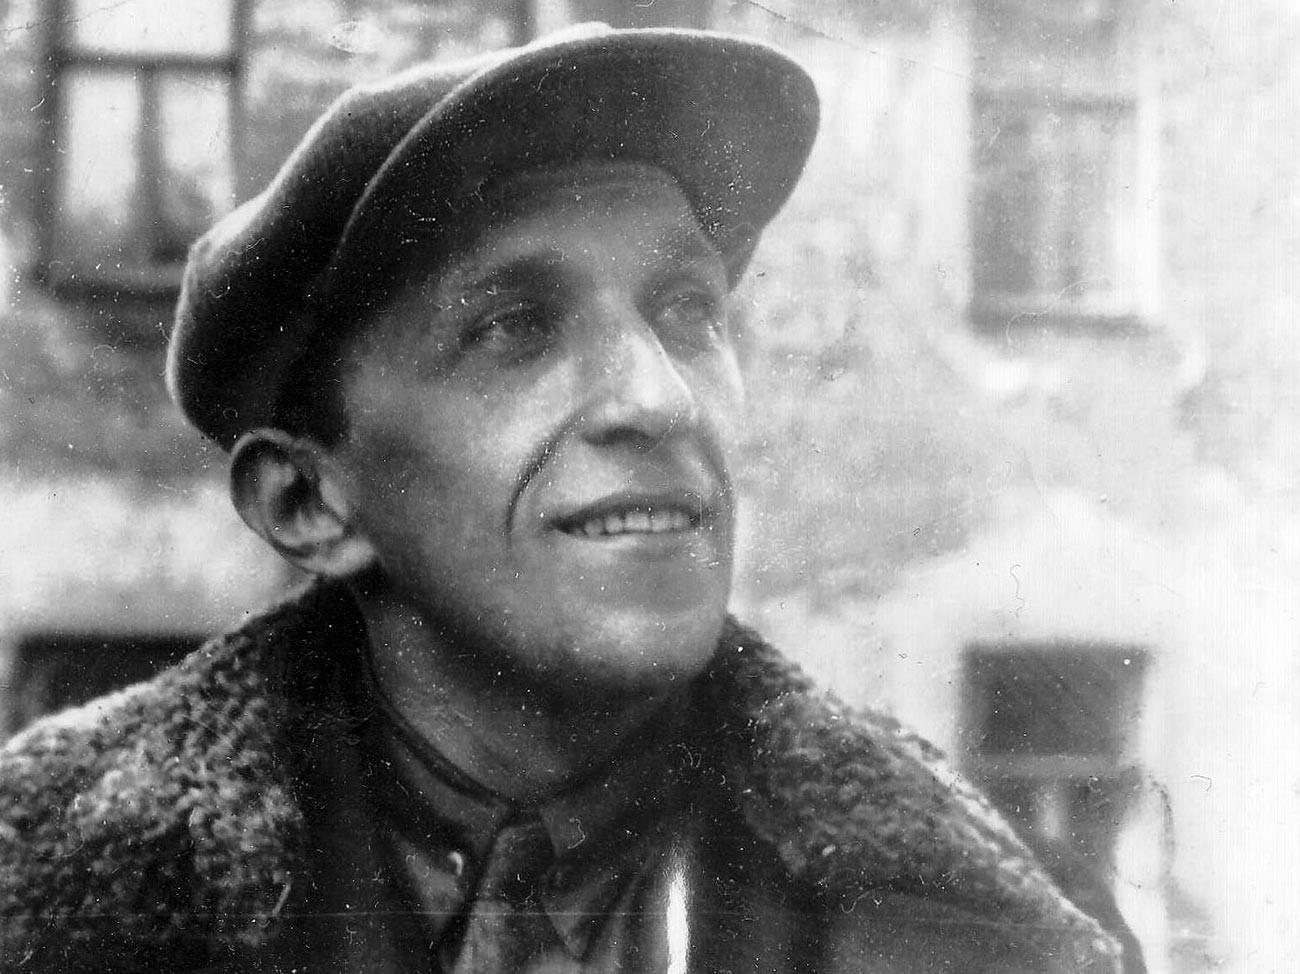 Jakow Serebrjanski